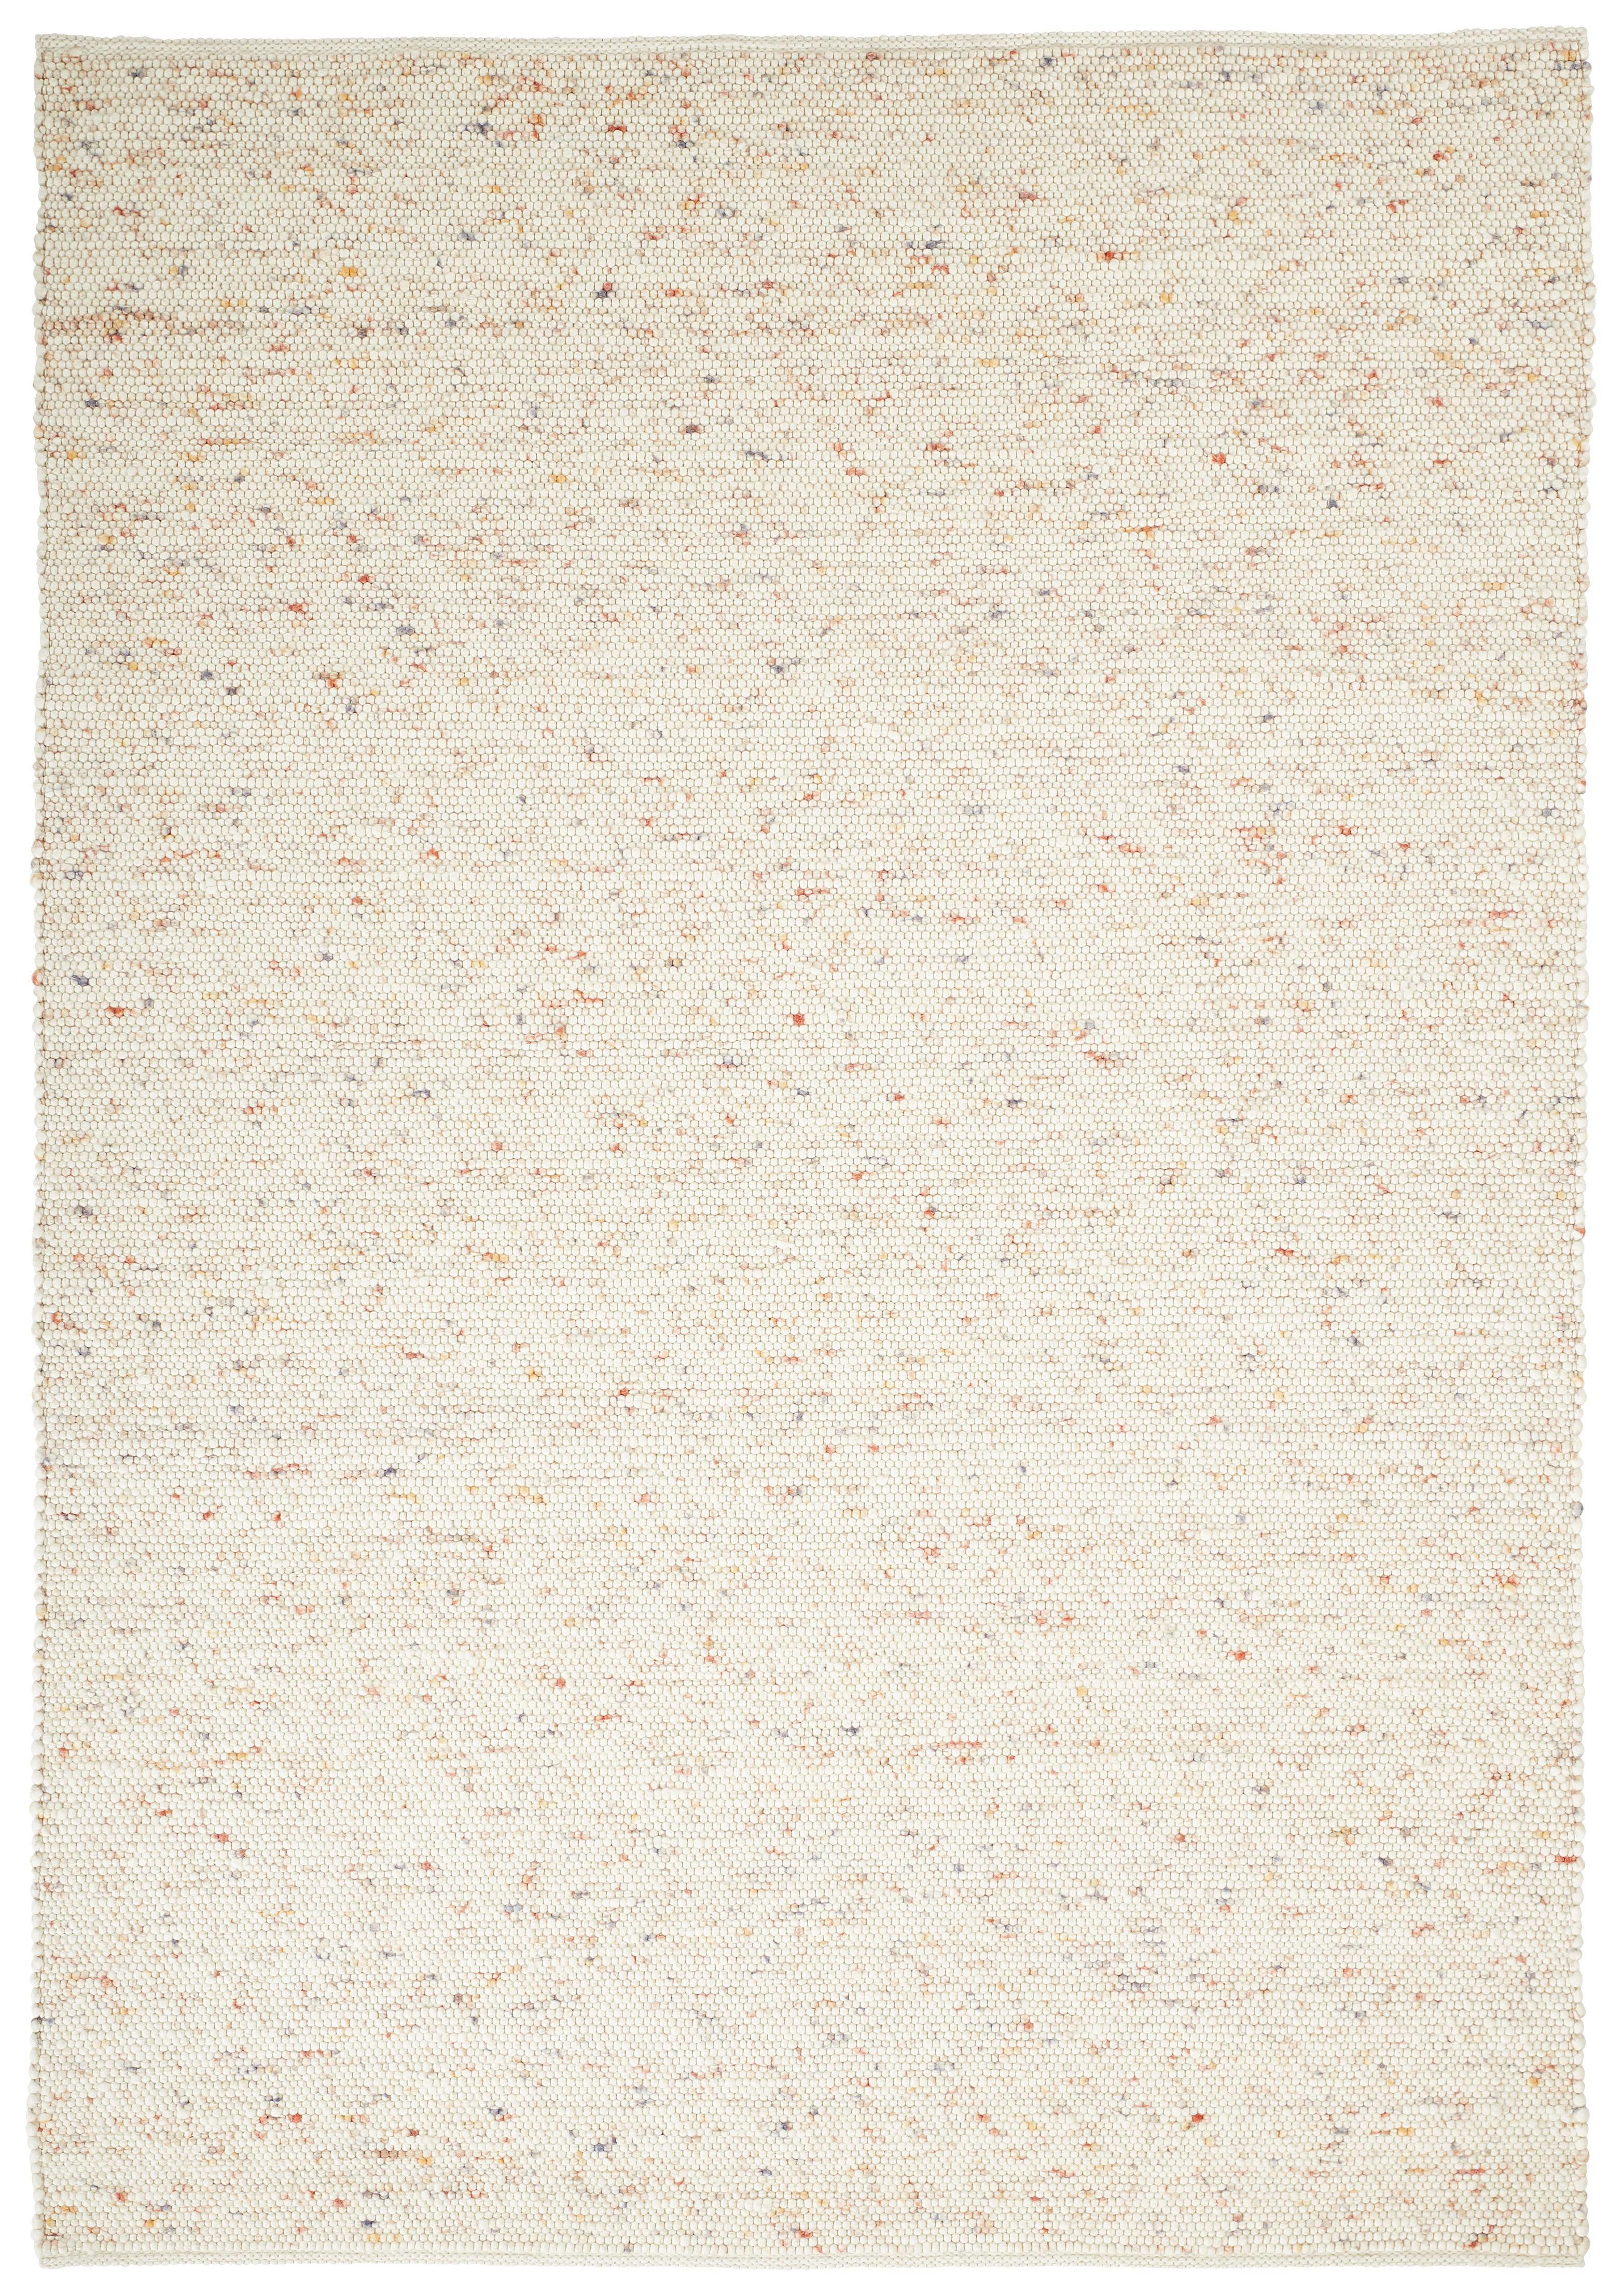 HANDWEBTEPPICH  Multicolor  70/140 cm - Multicolor, Weitere Naturmaterialien (70/140cm) - LINEA NATURA